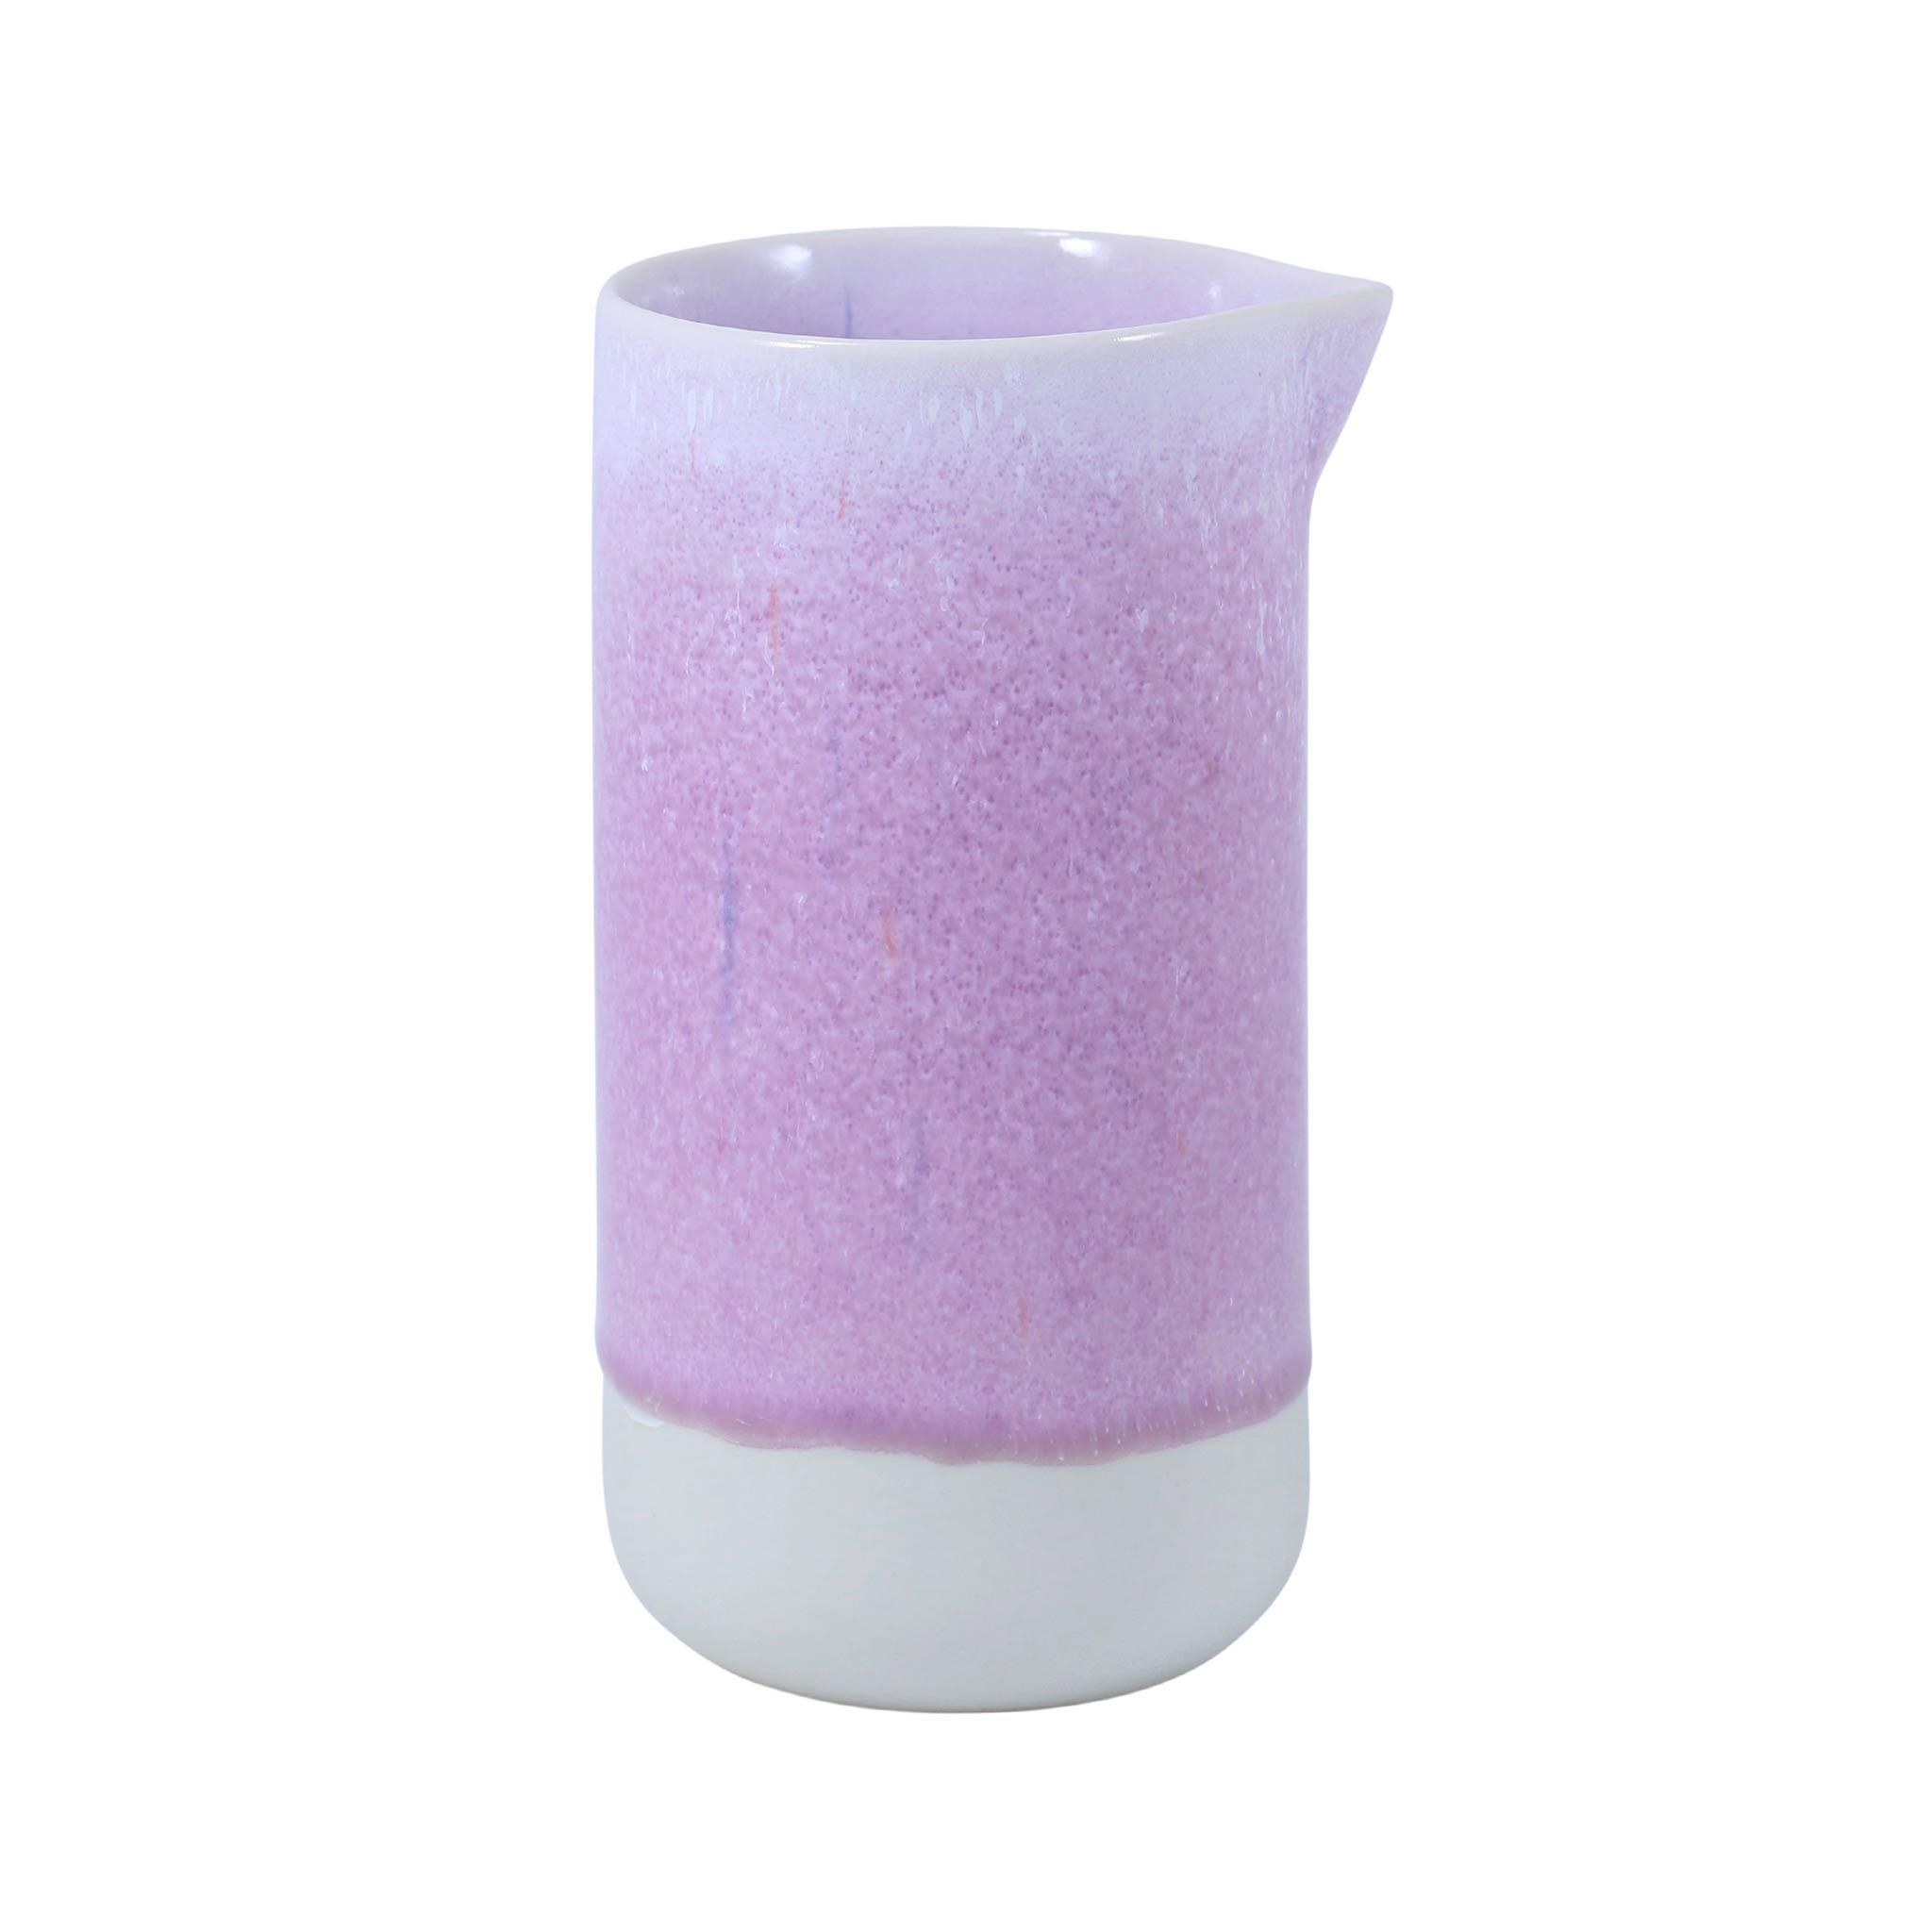 STUDIO ARHØJ - Splash Jar, Orchid Jam